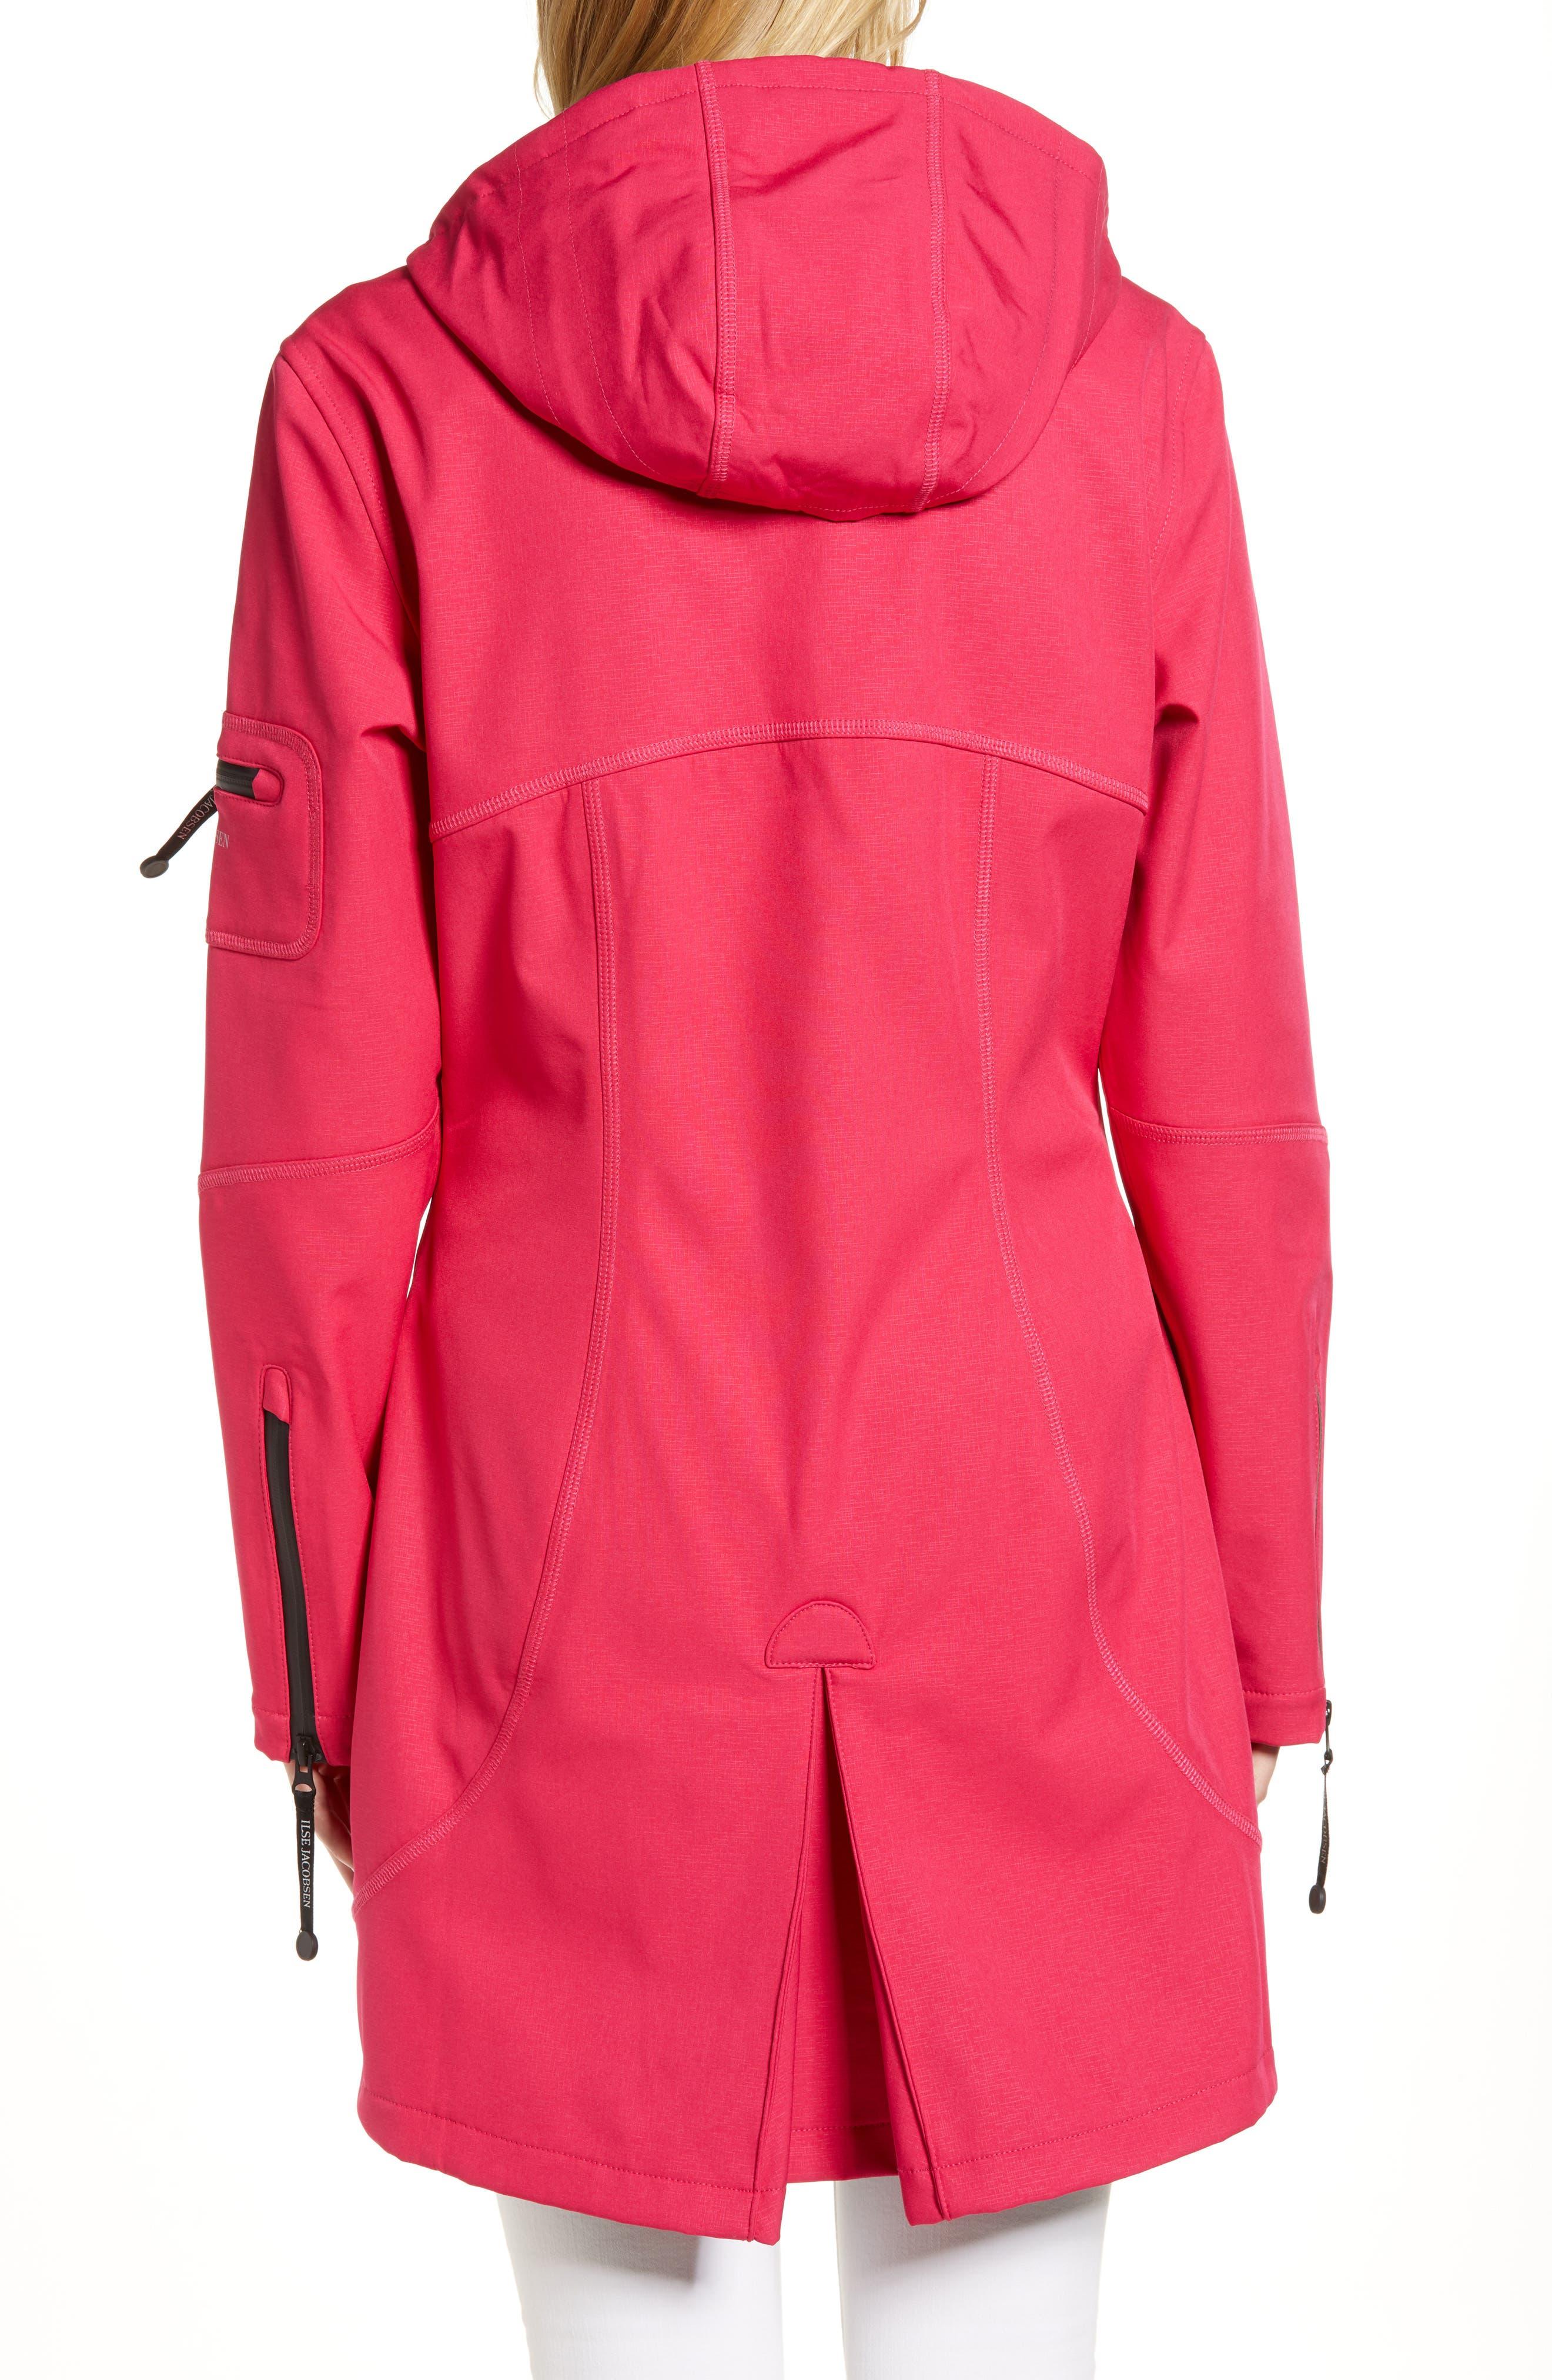 Rain 7 Hooded Water Resistant Coat,                             Alternate thumbnail 2, color,                             Warm Pink